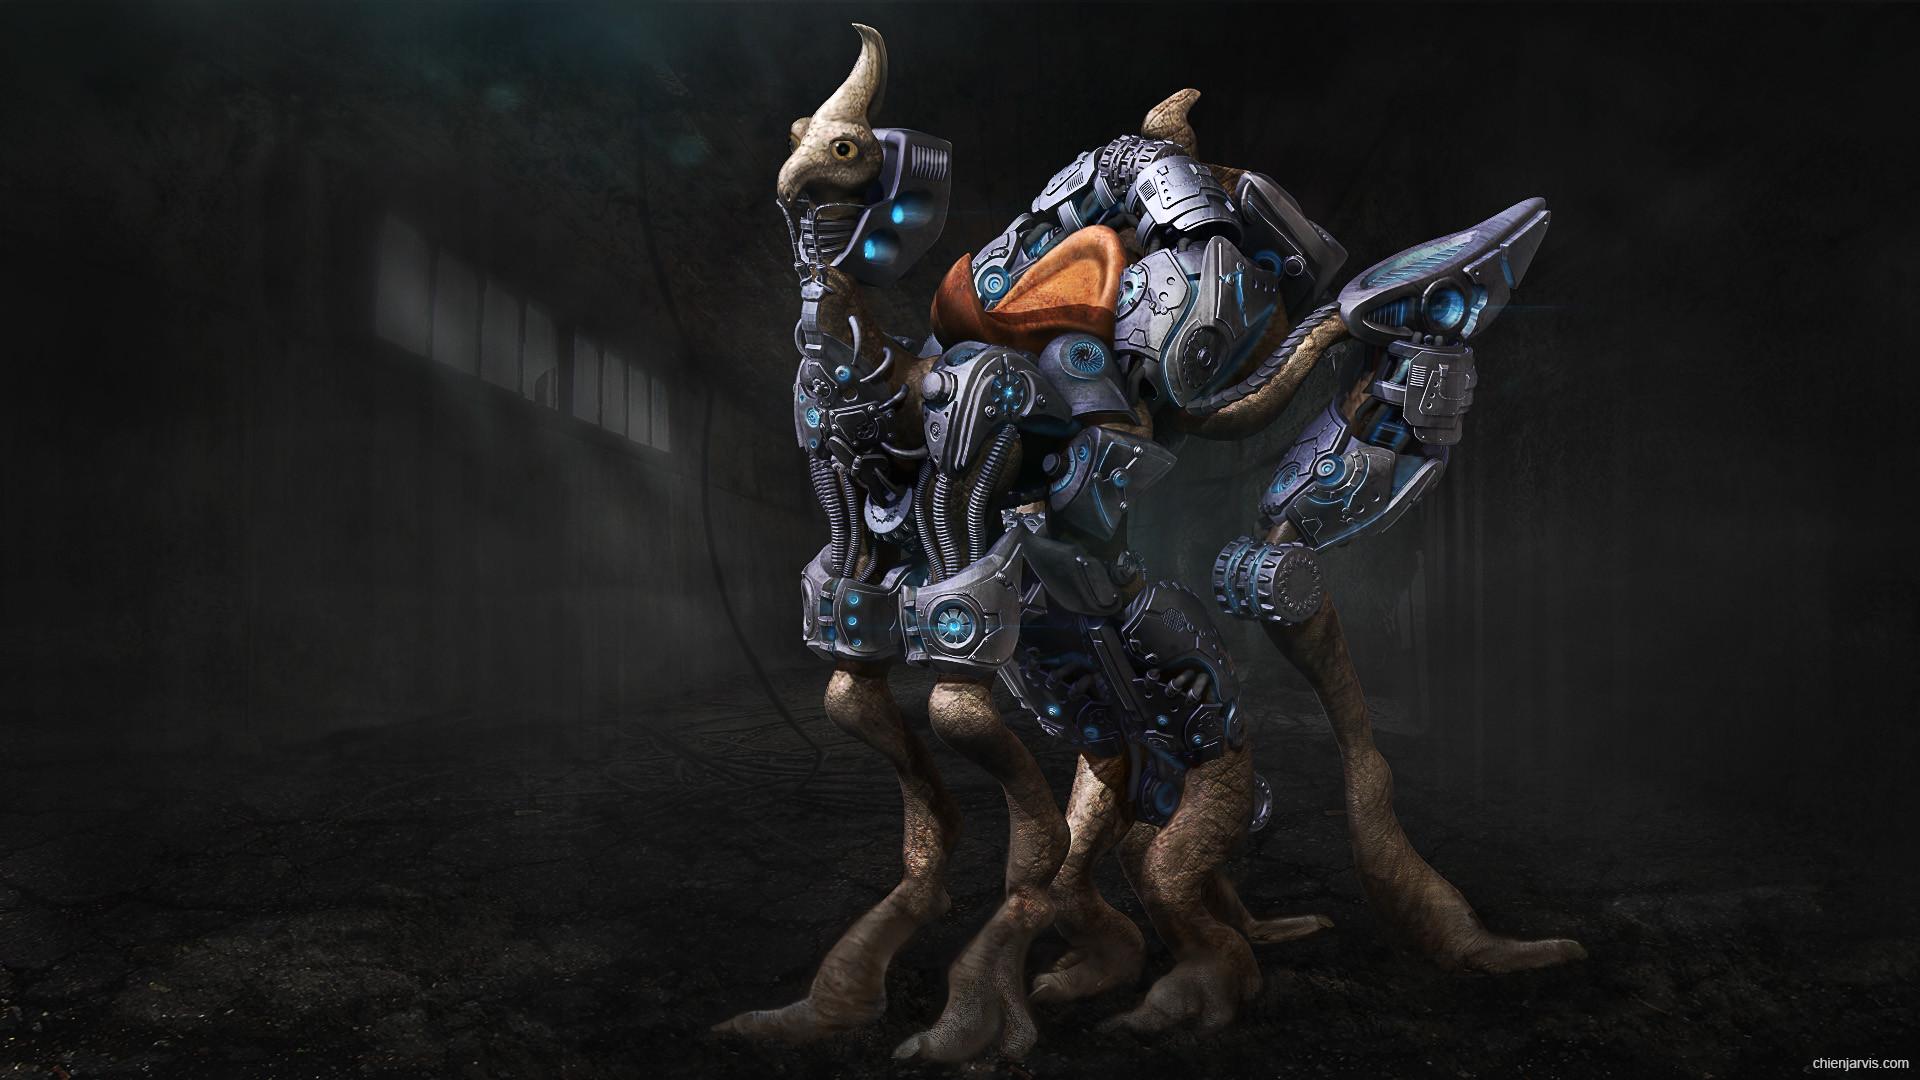 Chien jarvis cyborg creature 02